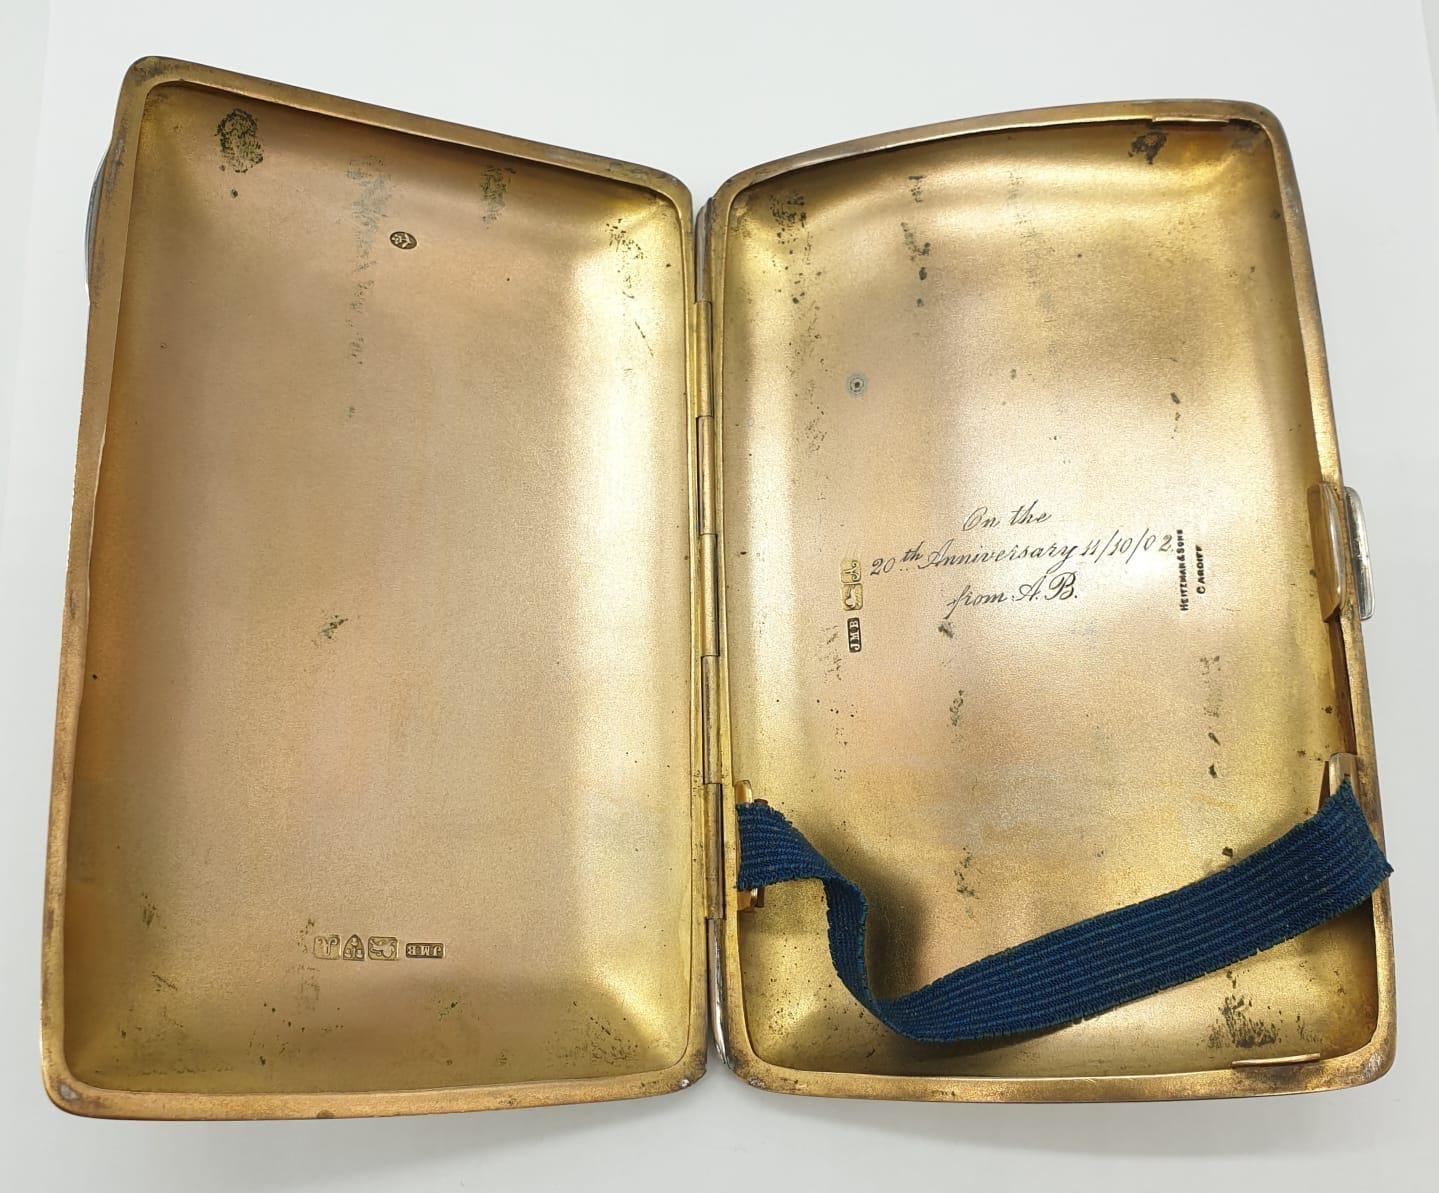 Edwardian John Millward Banks, Sterling Silver Cigarette Case Box with engraving on front, - Image 4 of 8